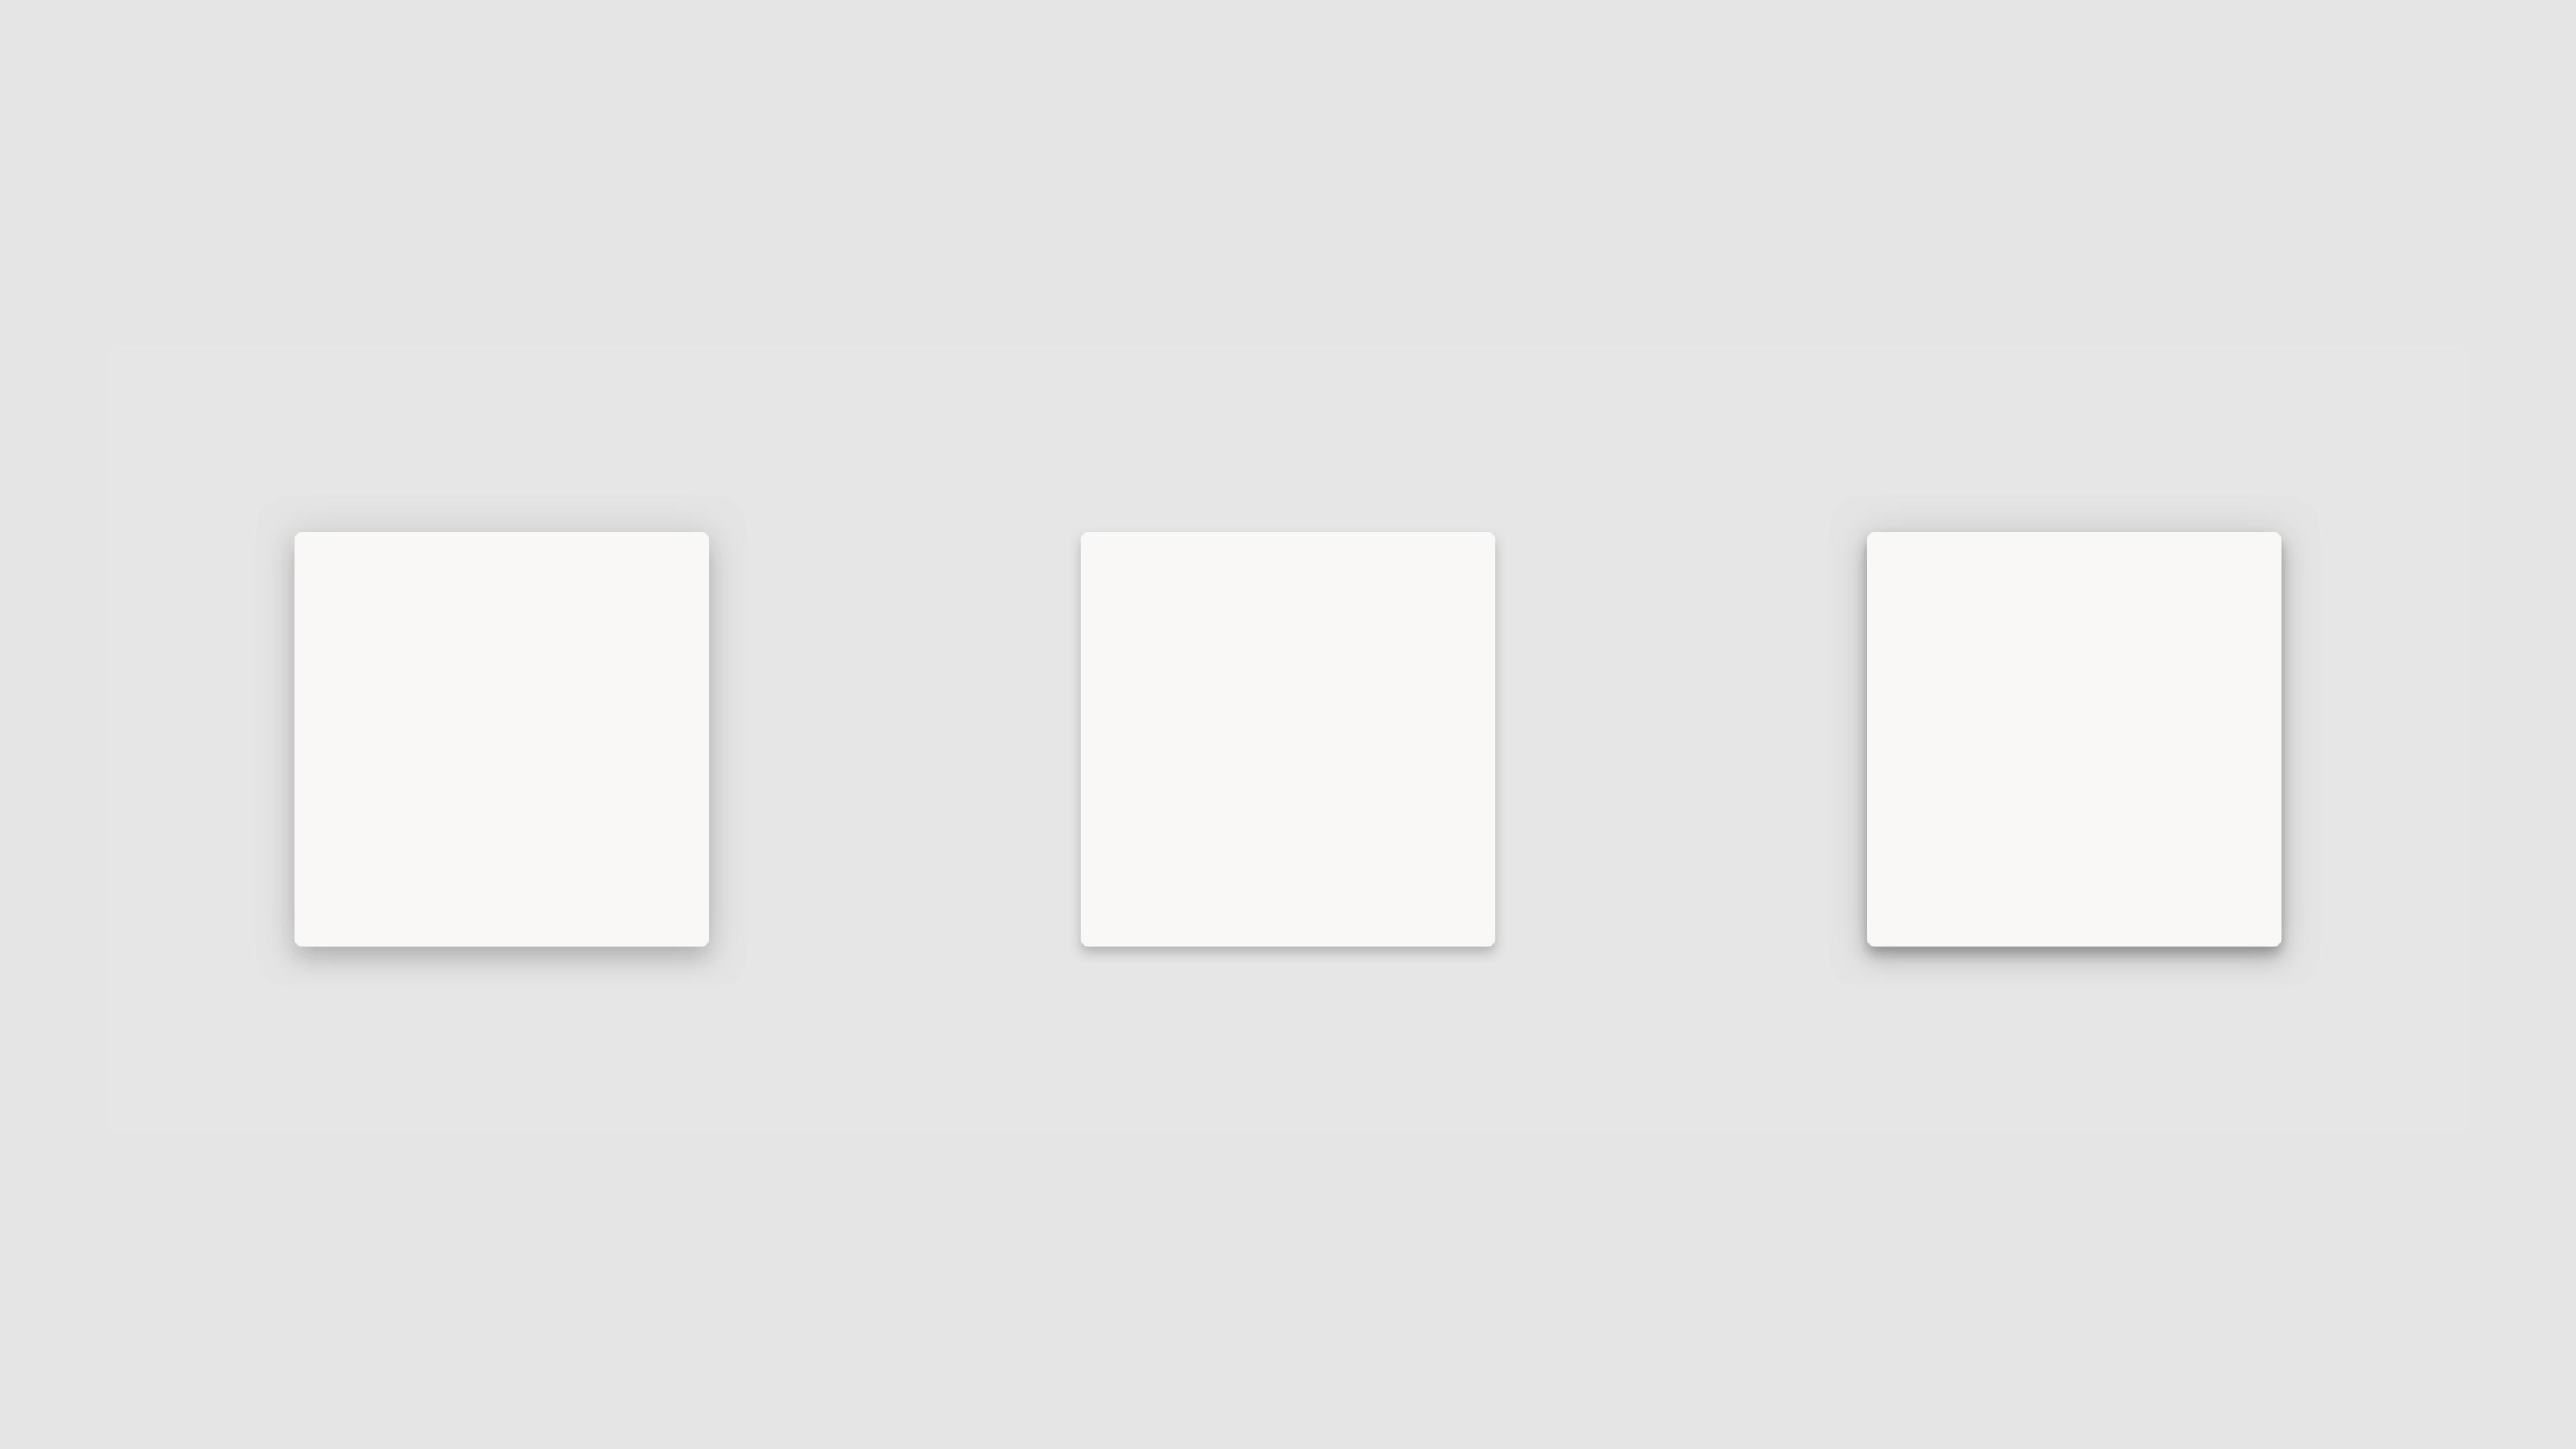 Infografik userinterfacedesign Designsystem 01 Licht